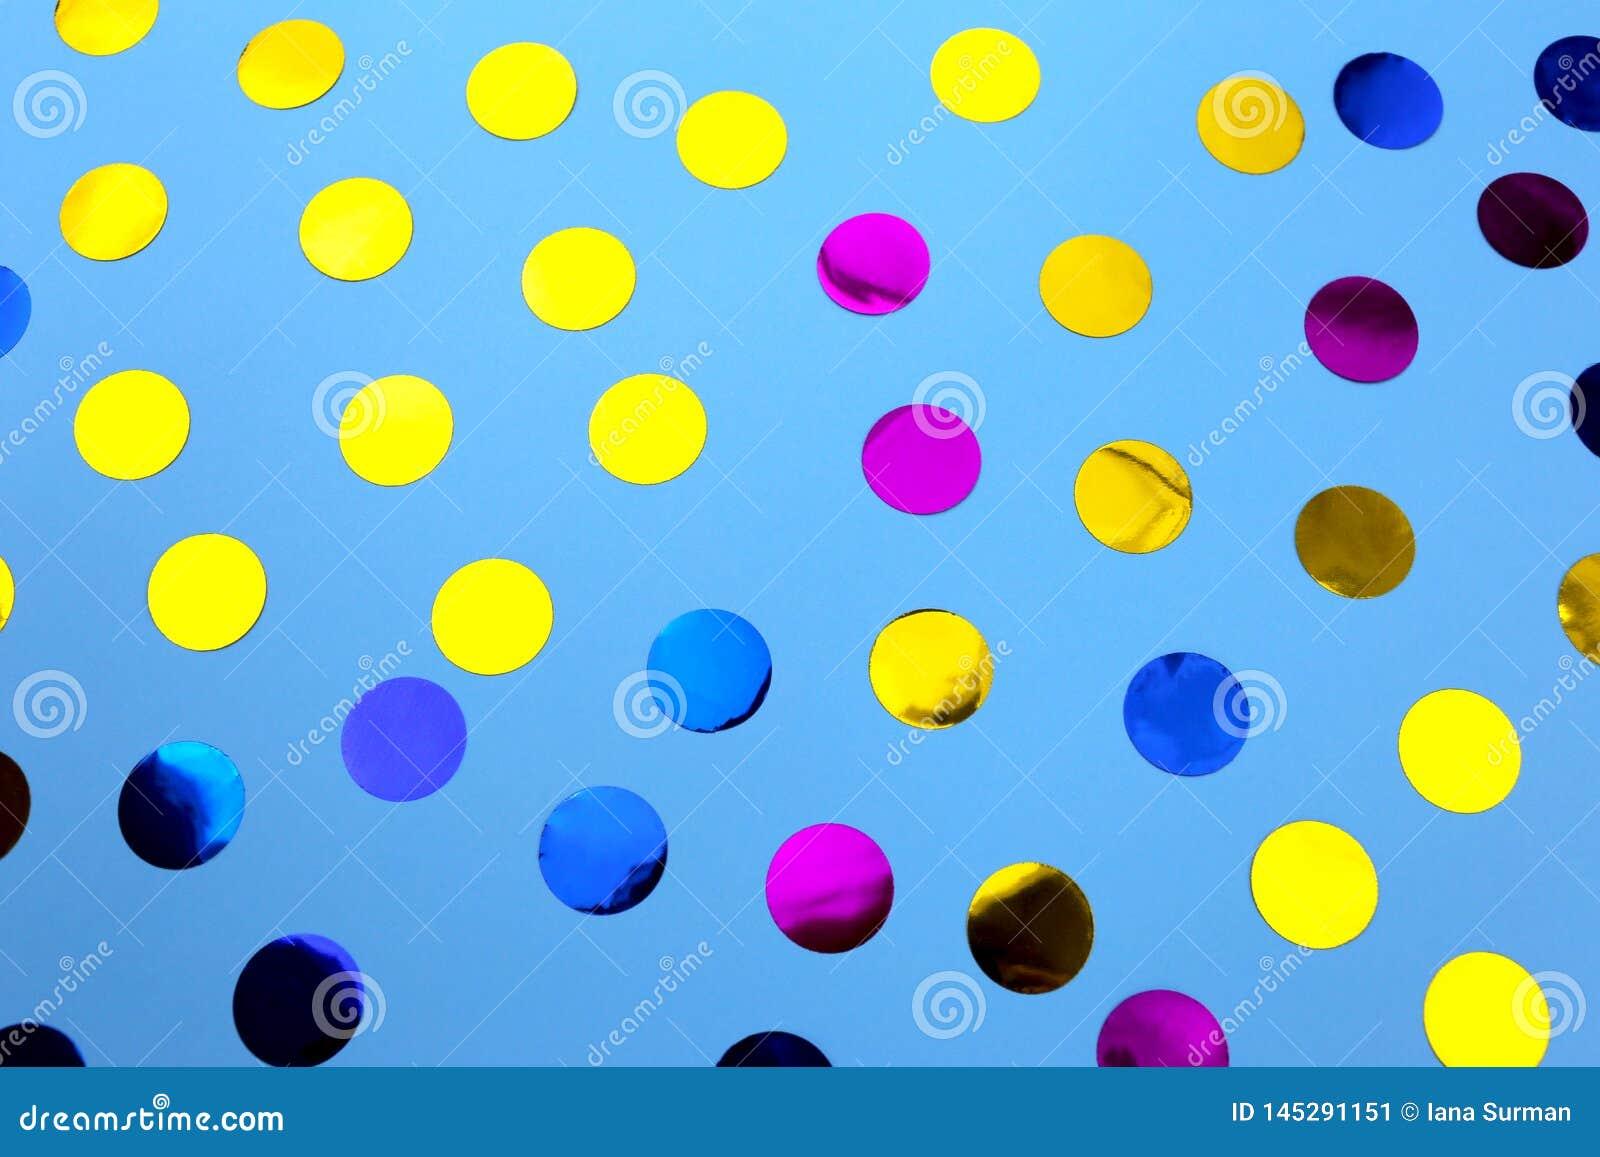 Round confetti on blue background.